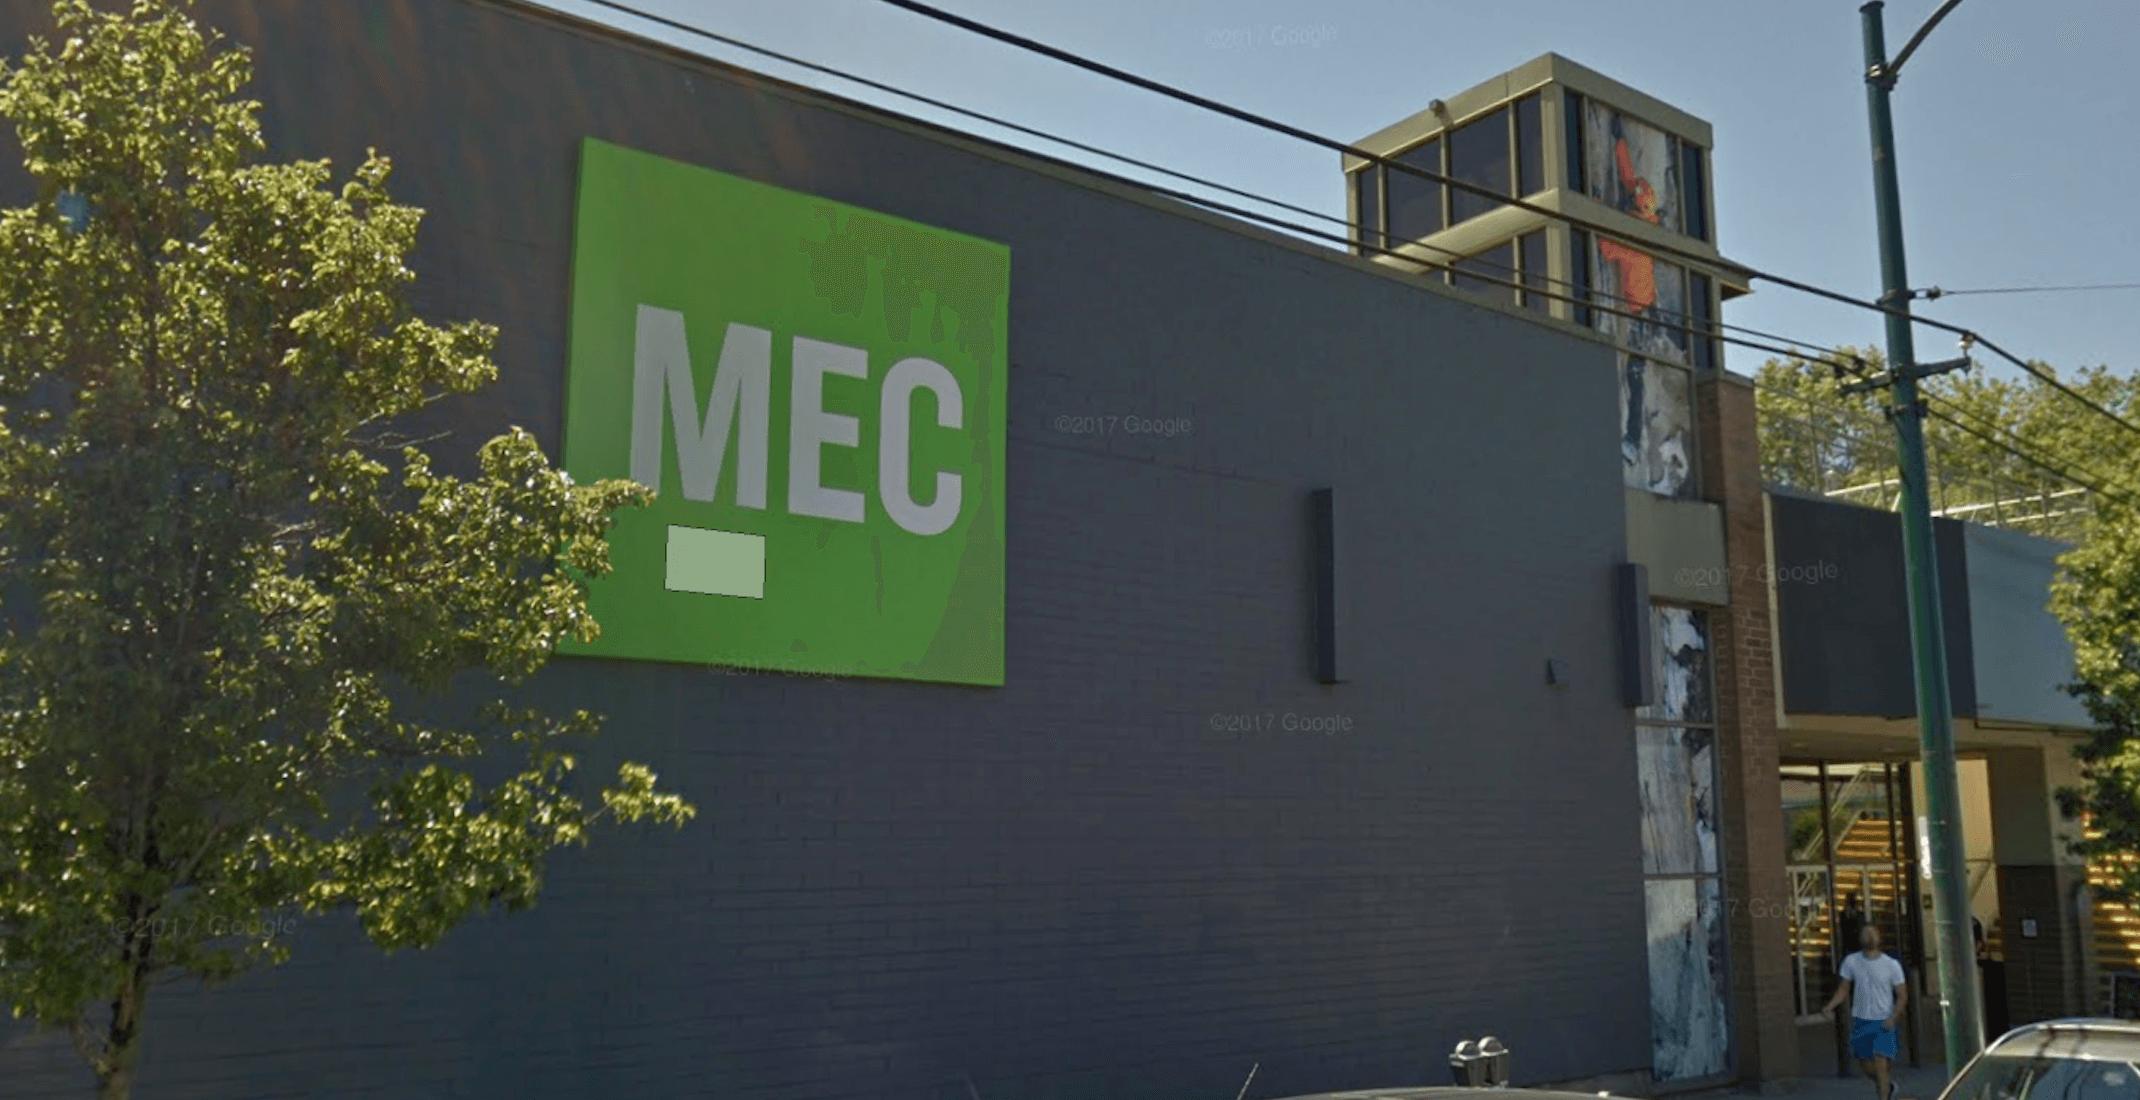 MEC will drop brands tied to US gun manufacturer in wake of Florida shooting